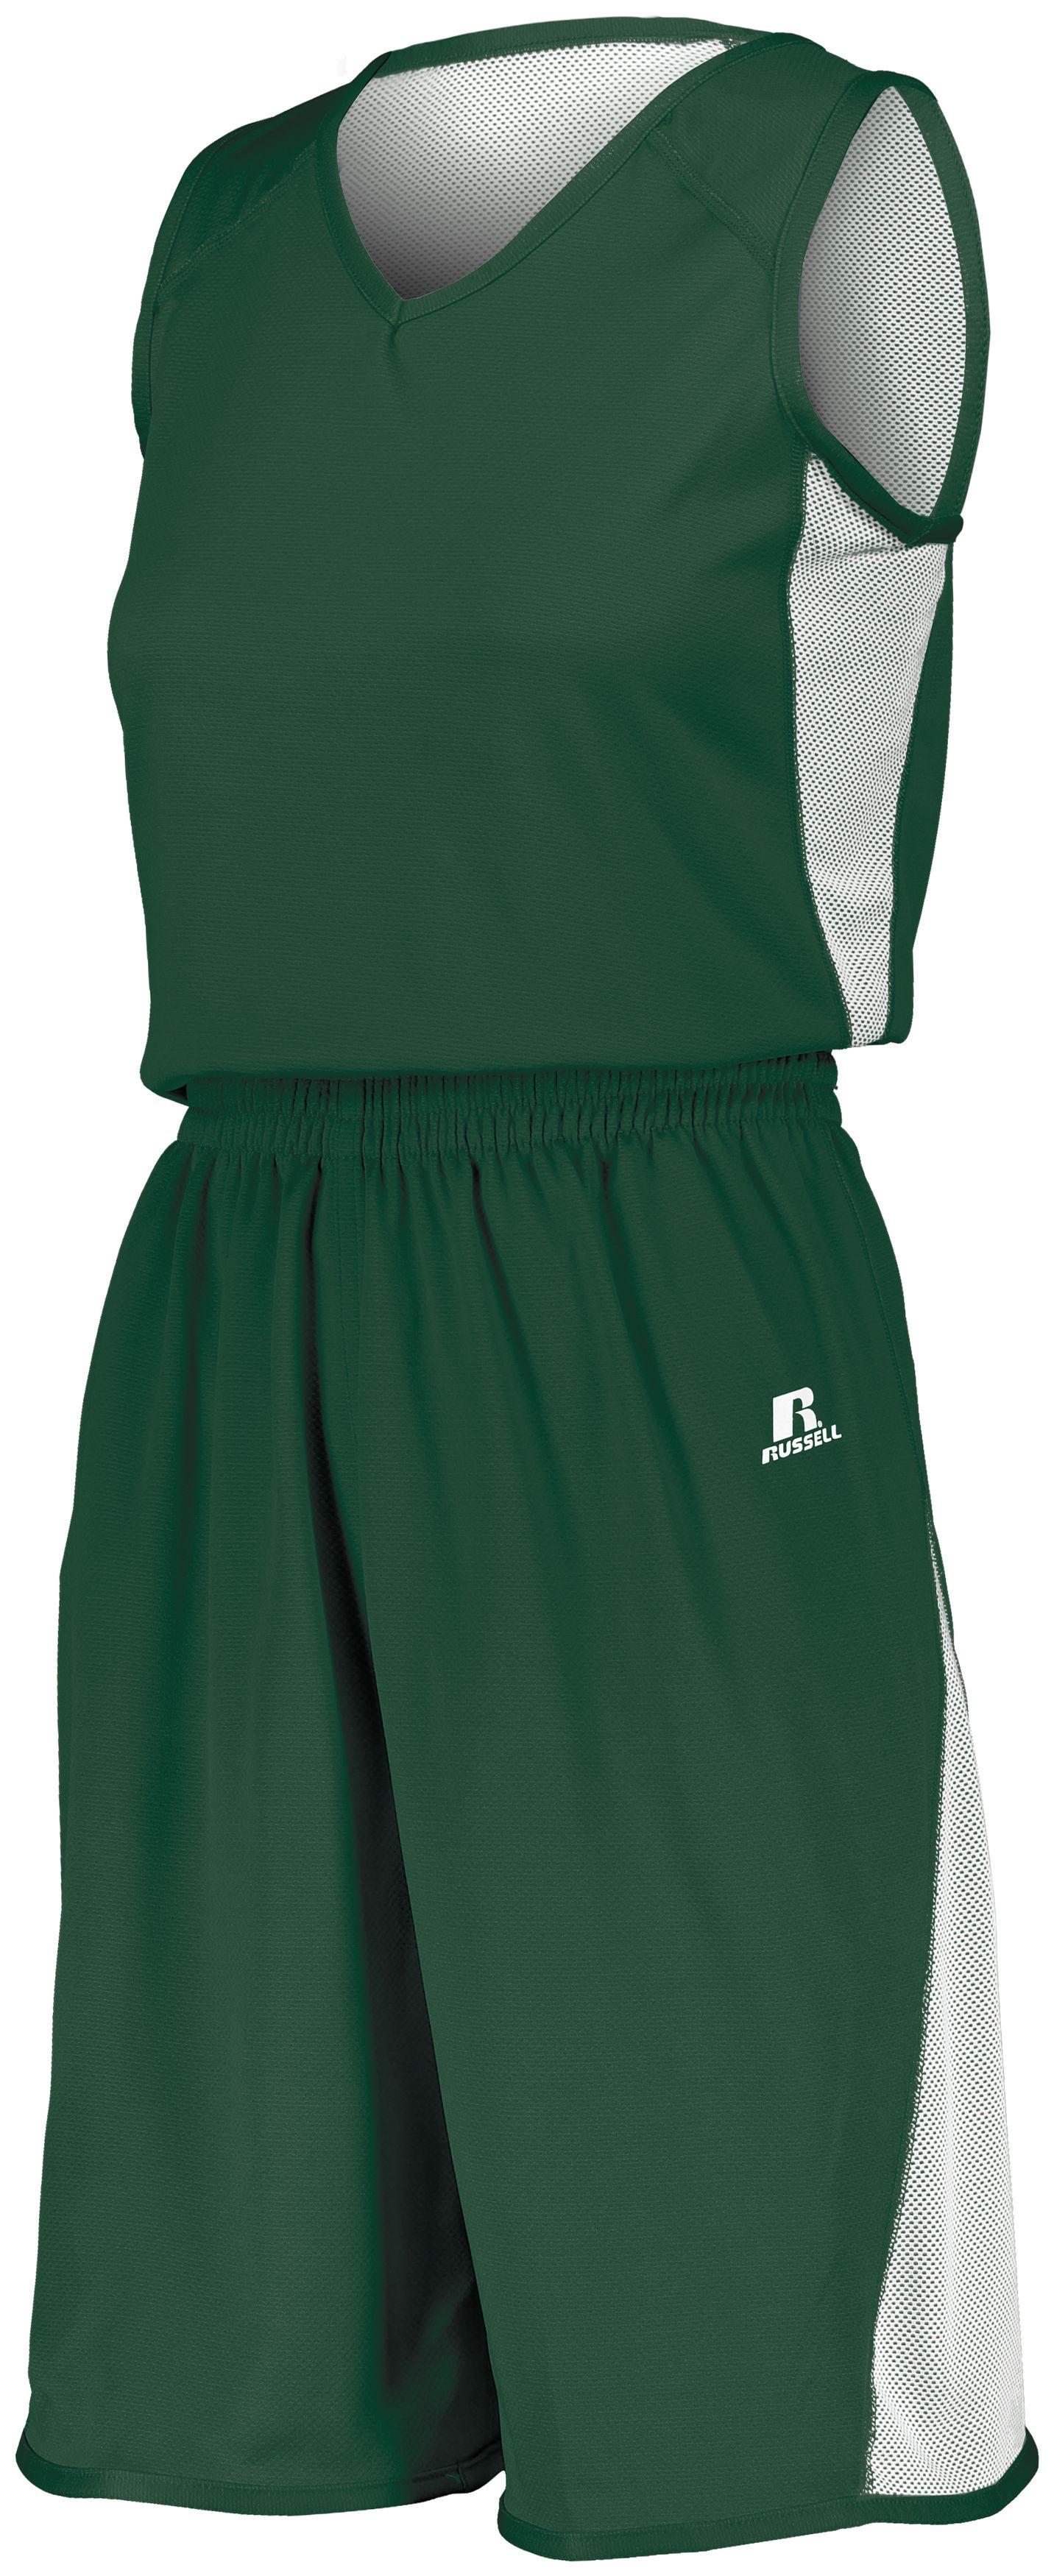 Ladies Undivided Single Ply Reversible Shorts - DARK GREEN/WHITE